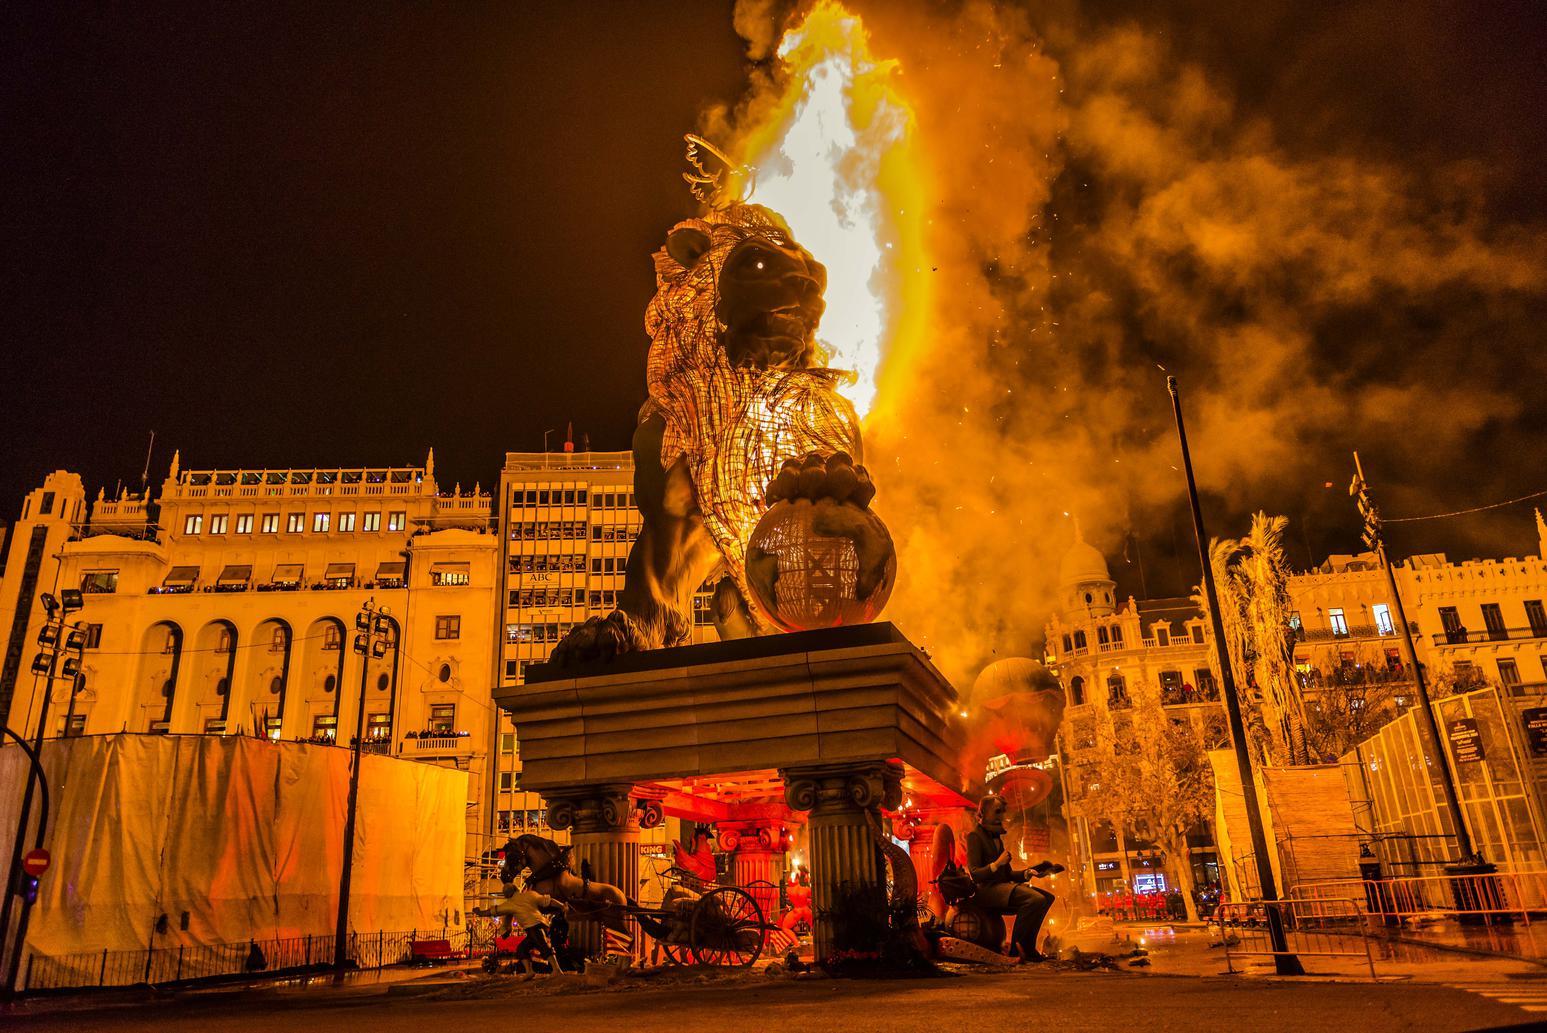 EJ2BEC Valencia, Spain. 20th Mar, 2015. The municipal falla monument 'la Fuerza' by artist Man